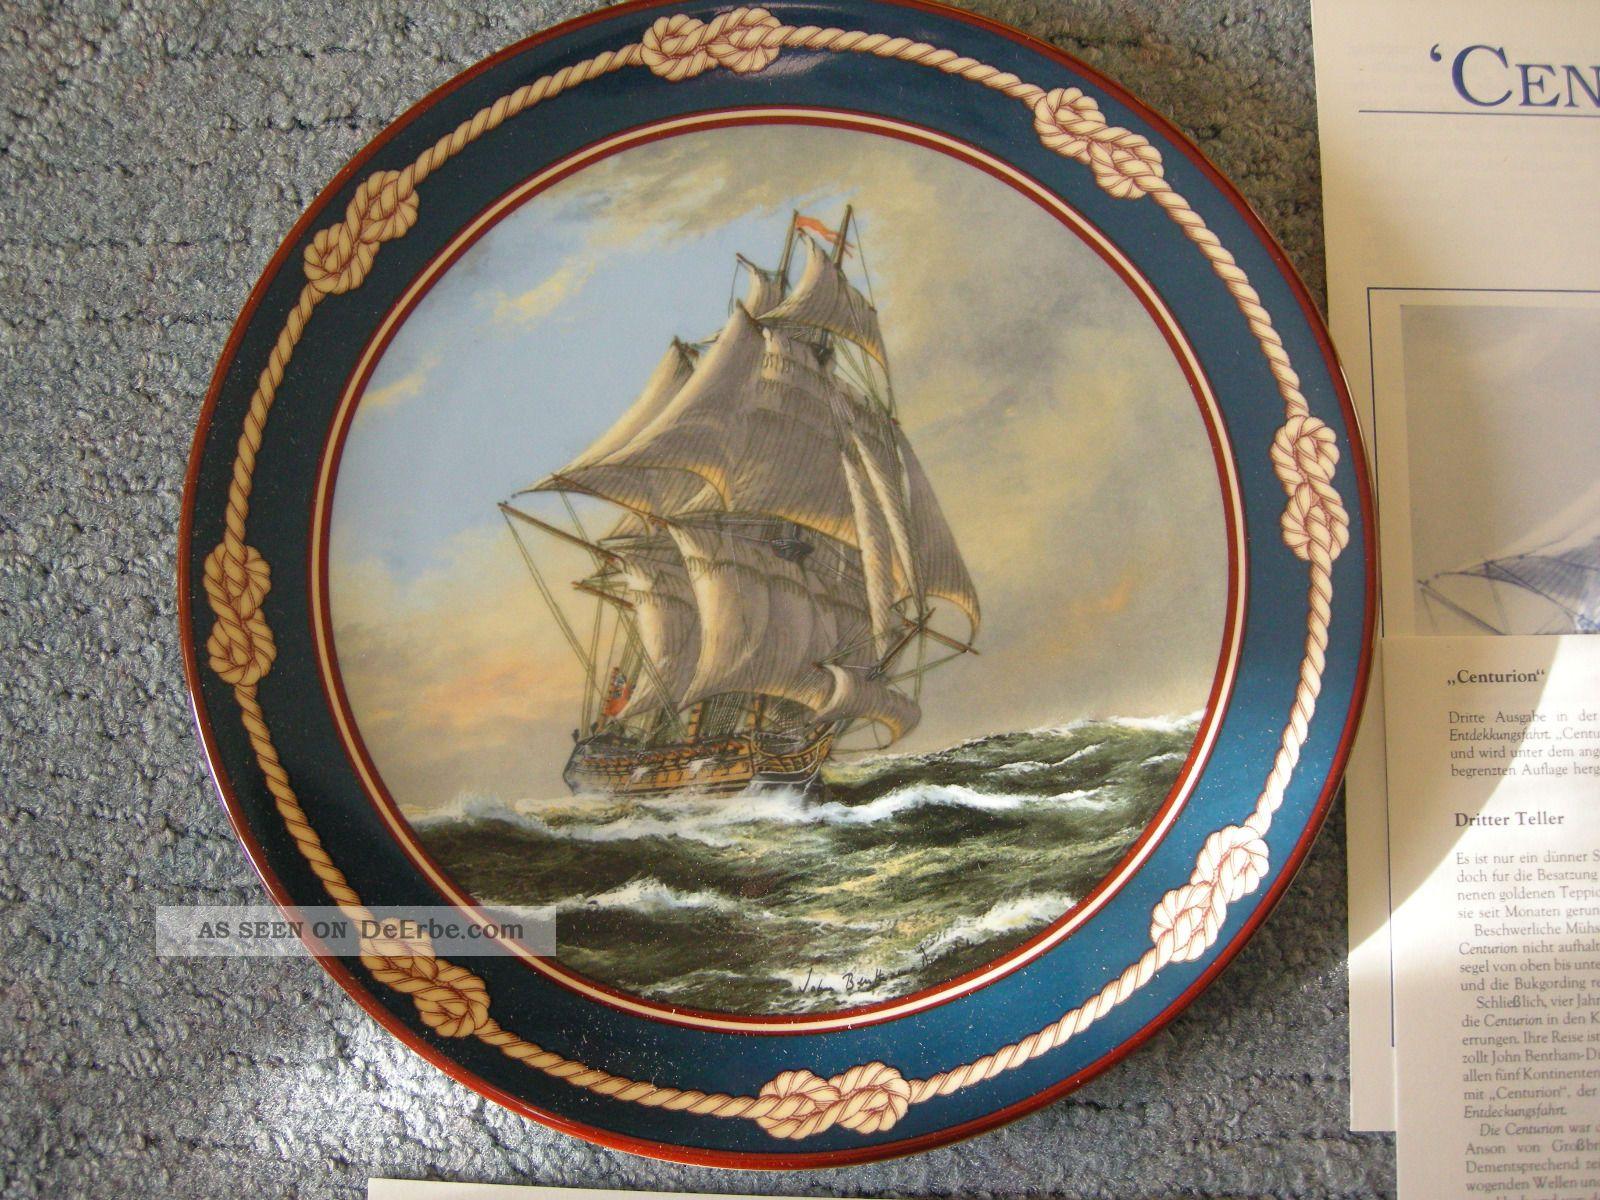 Royal Doulton Sammelteller Centurion Bentham - Dinsdale 26 - R62 - 26.  3 Nautika & Maritimes Bild